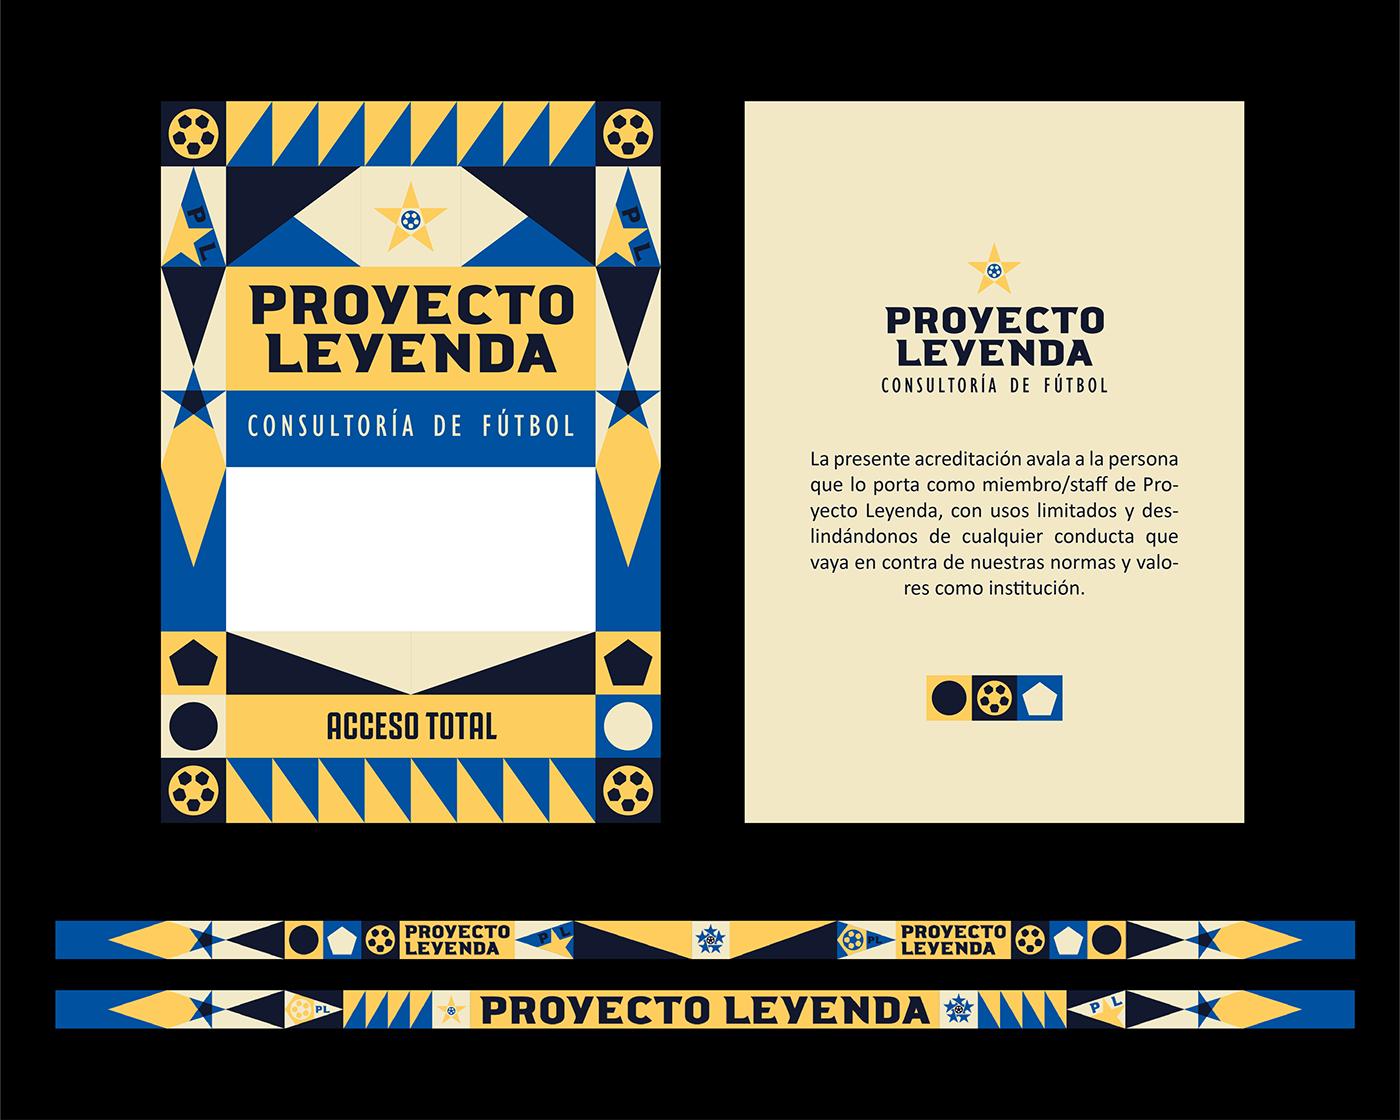 brand branding  BrandStudio Celebranding creative design marketing   Photography  deporte Futbol